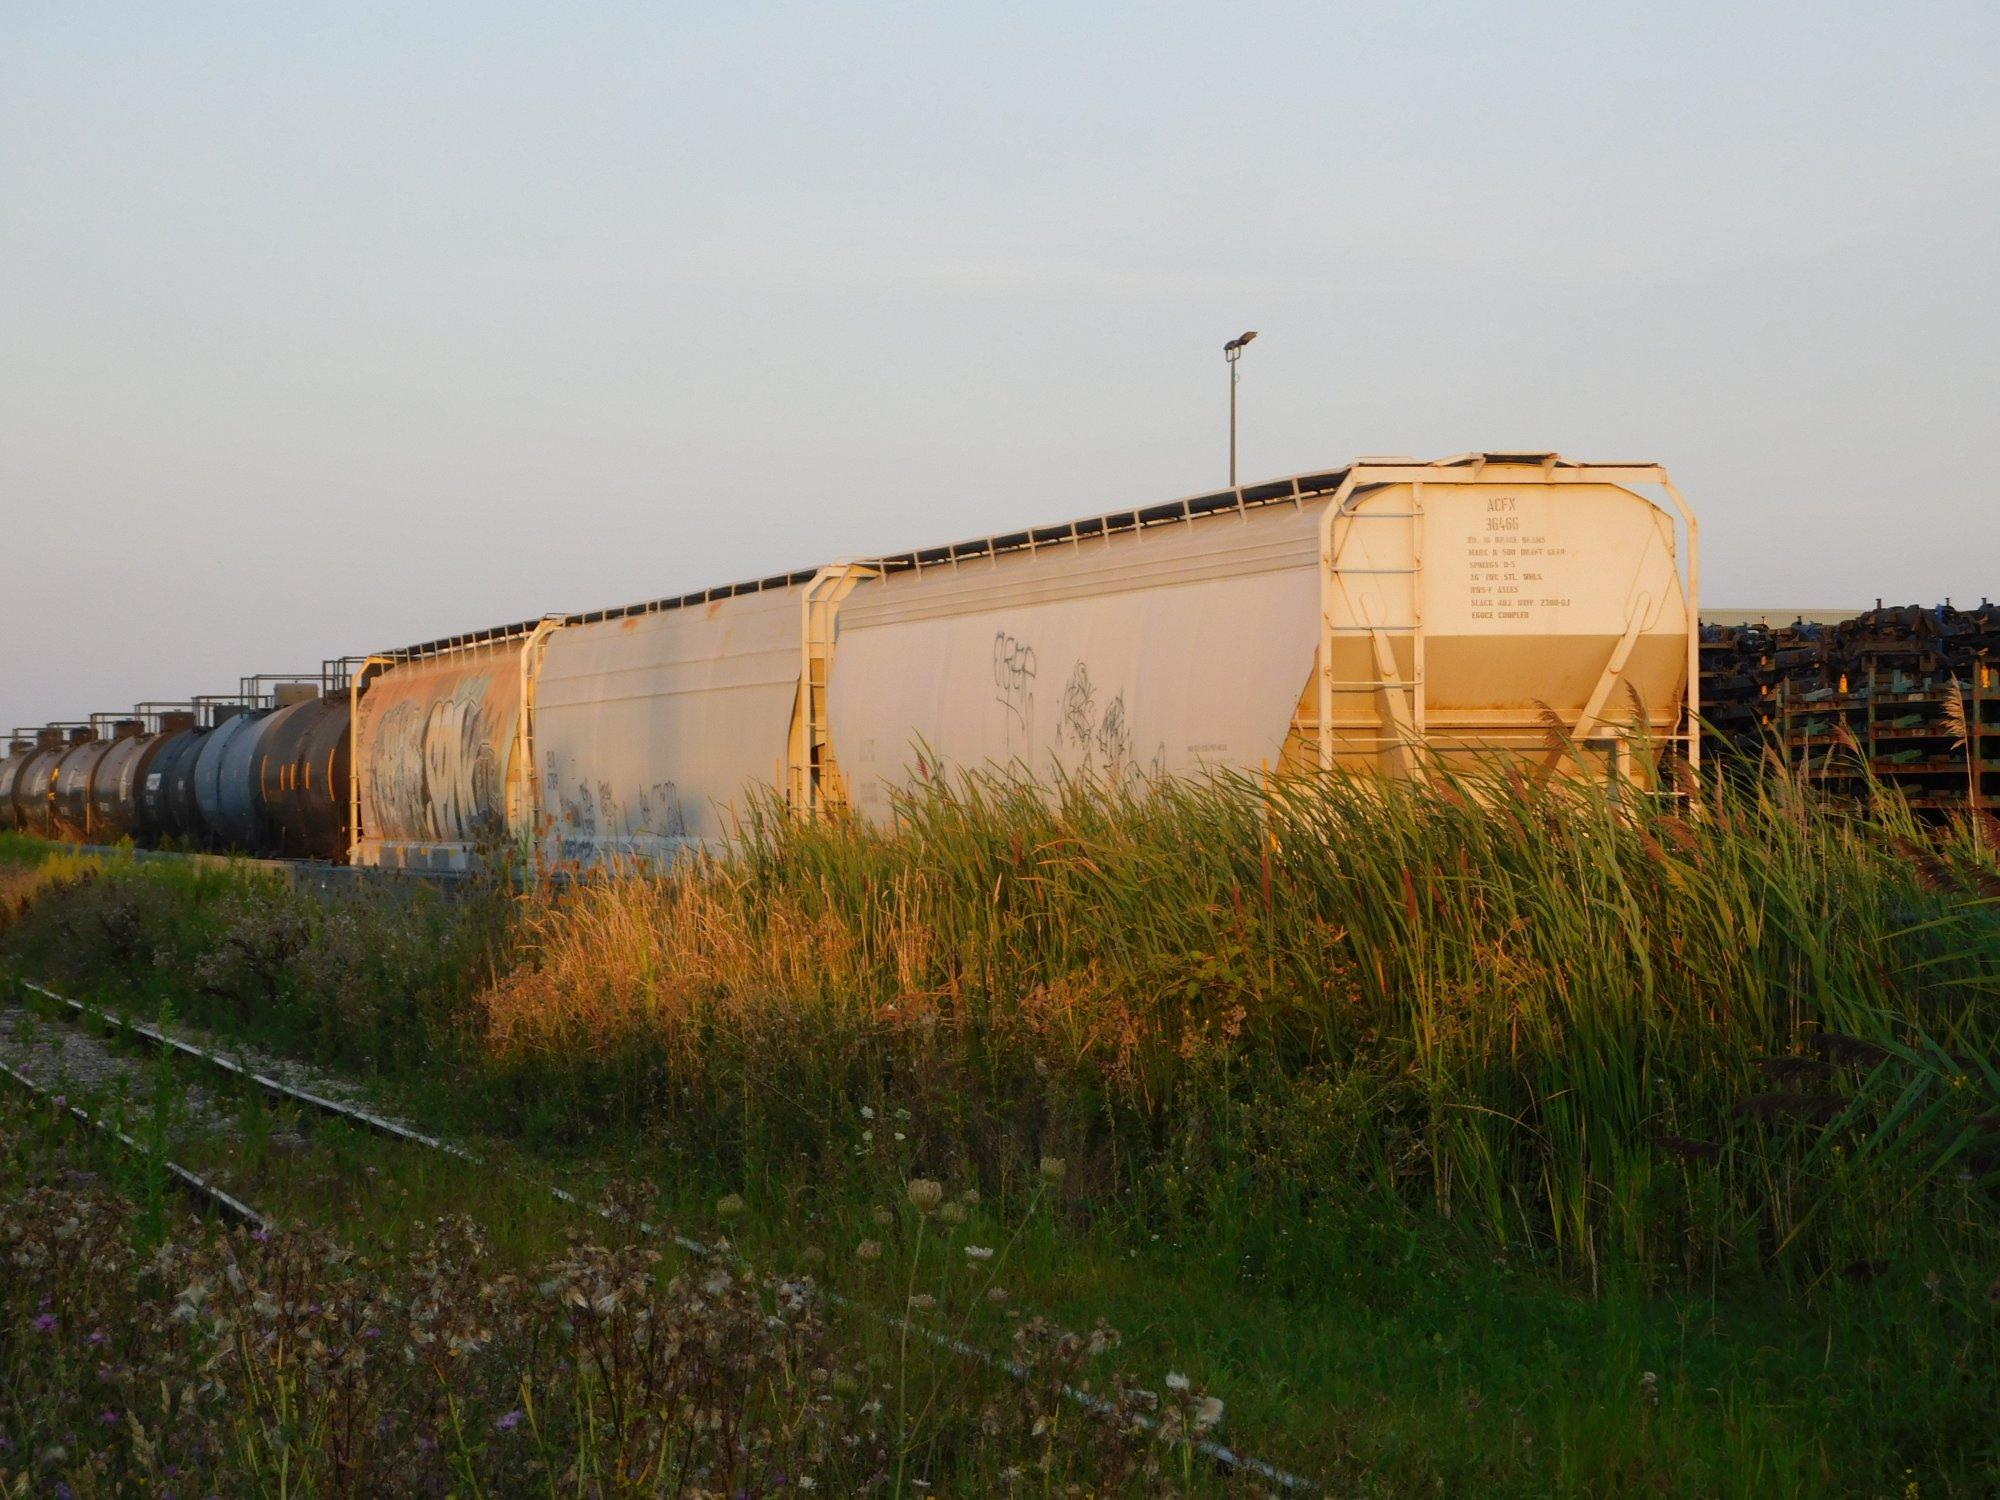 tra 054.jpg